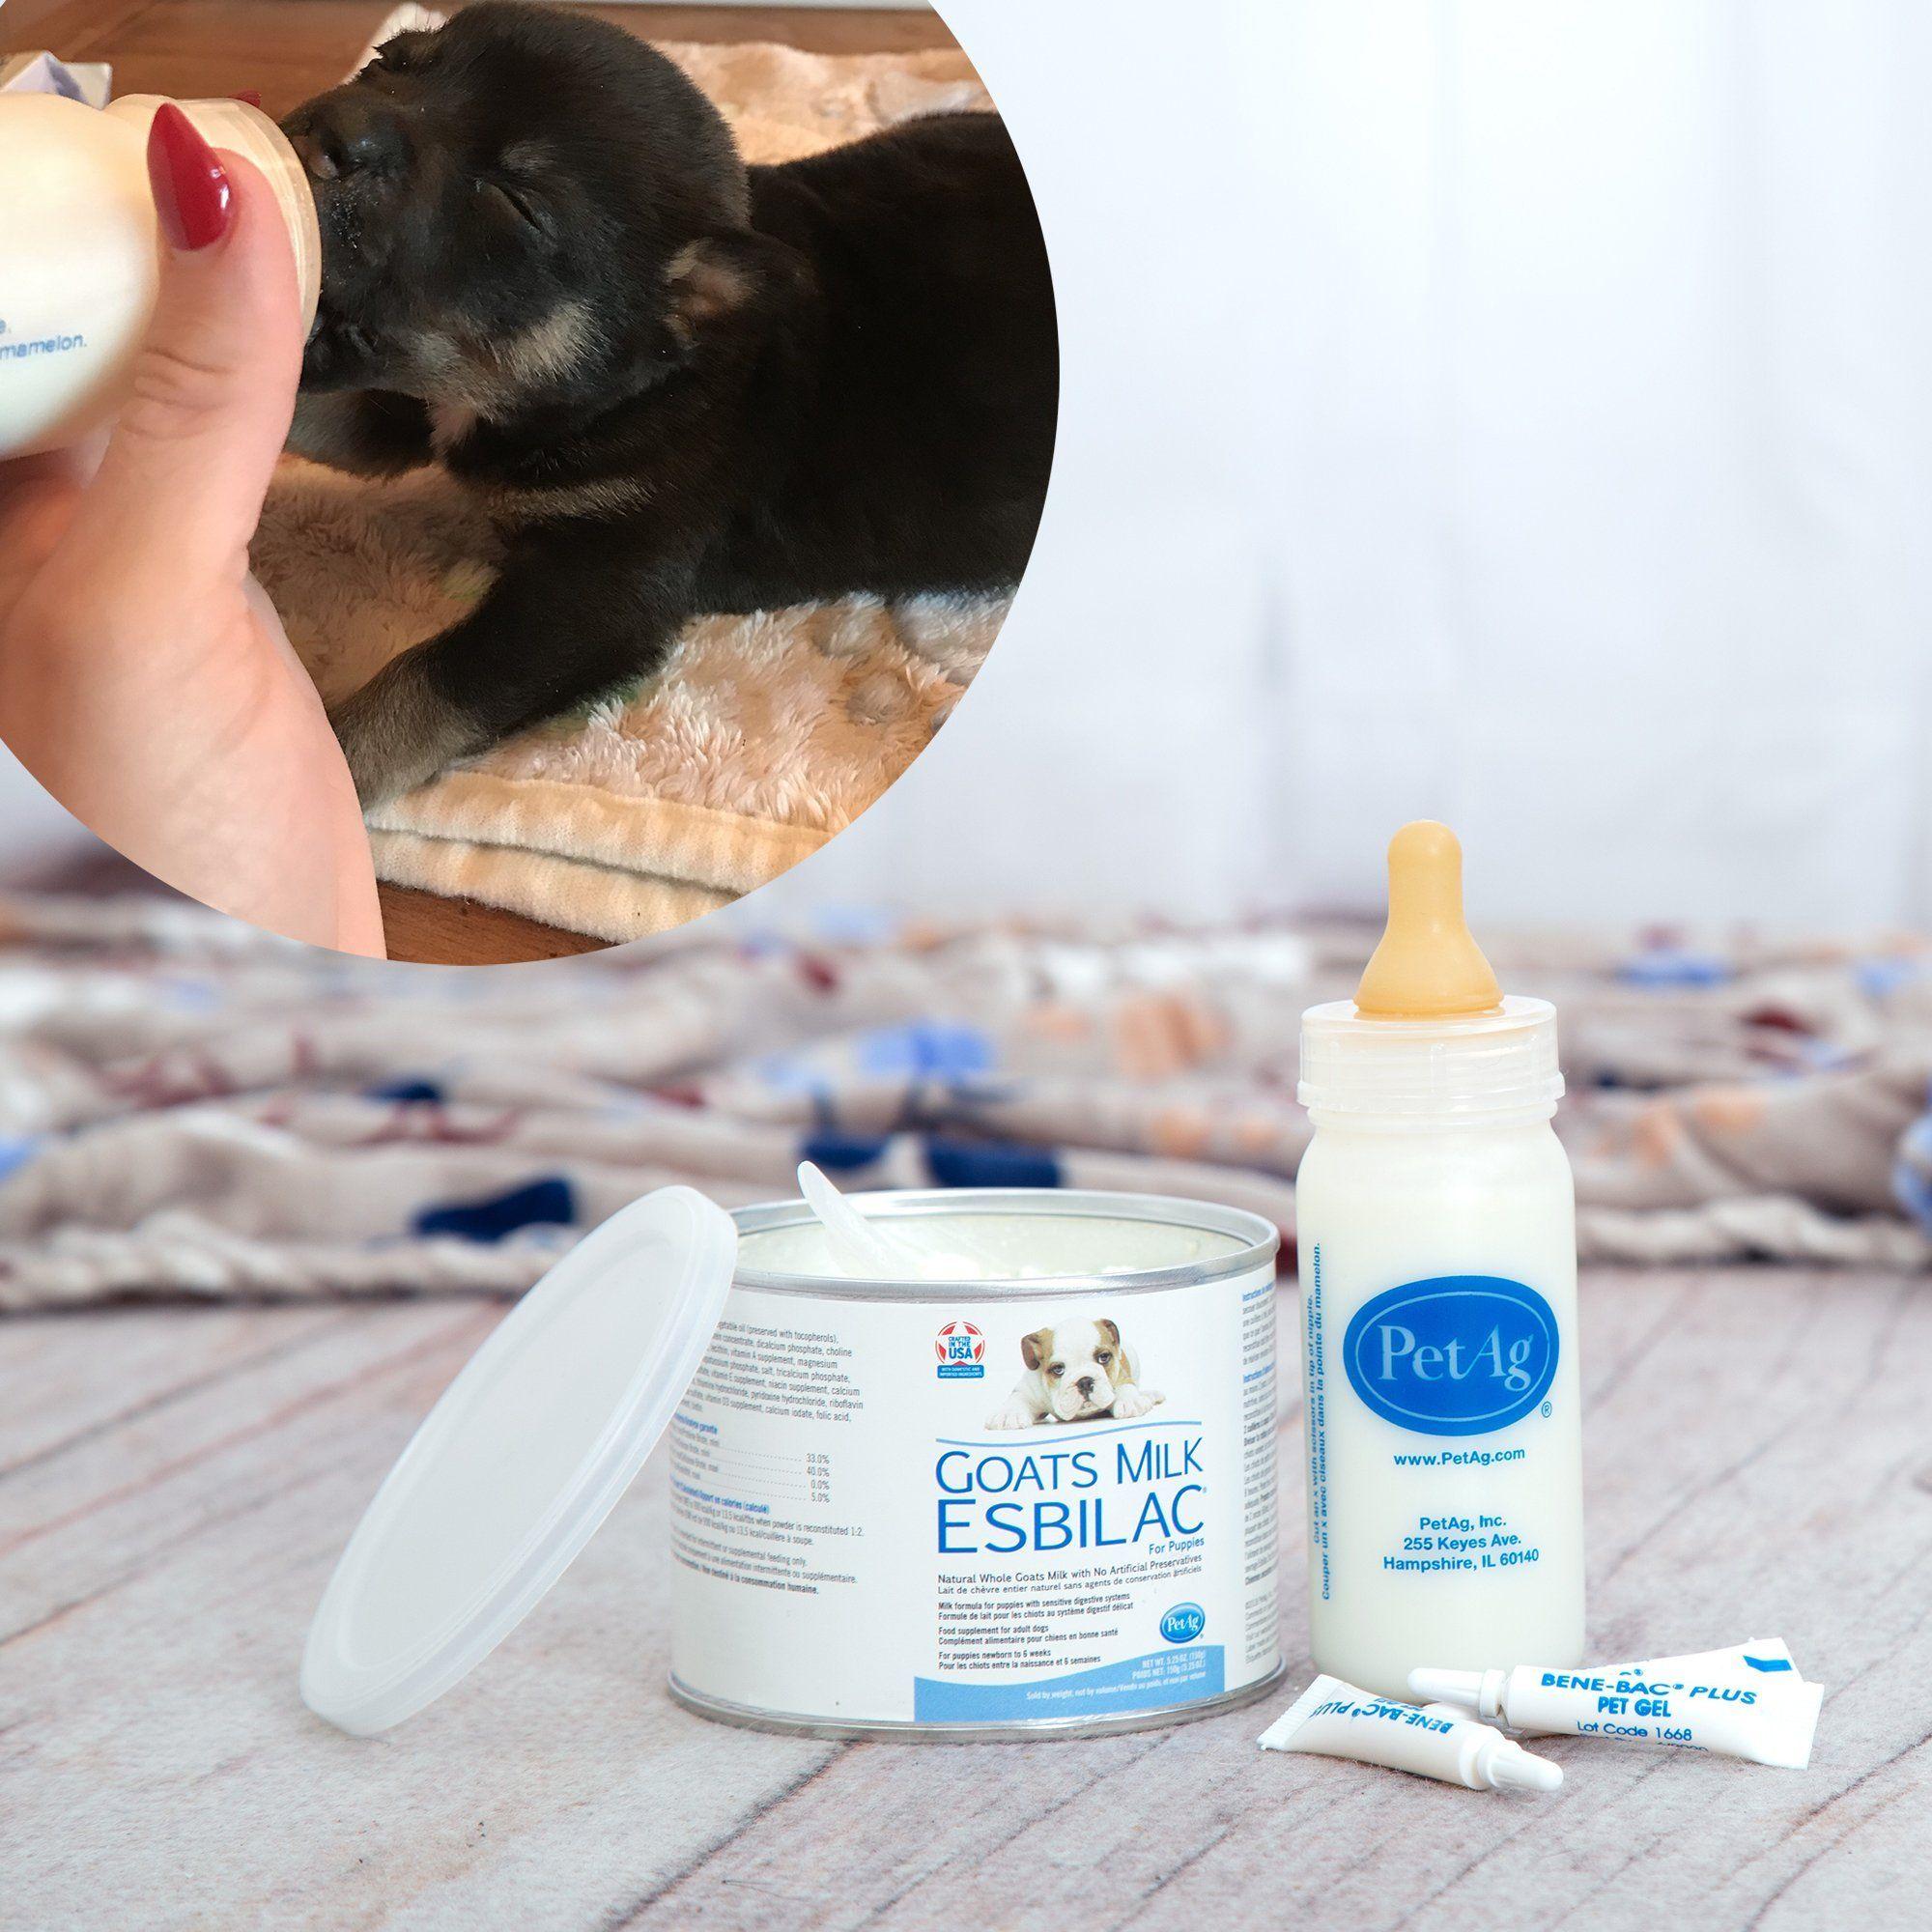 Emergency Care LifeSaving Formula Kits For Fur Babies